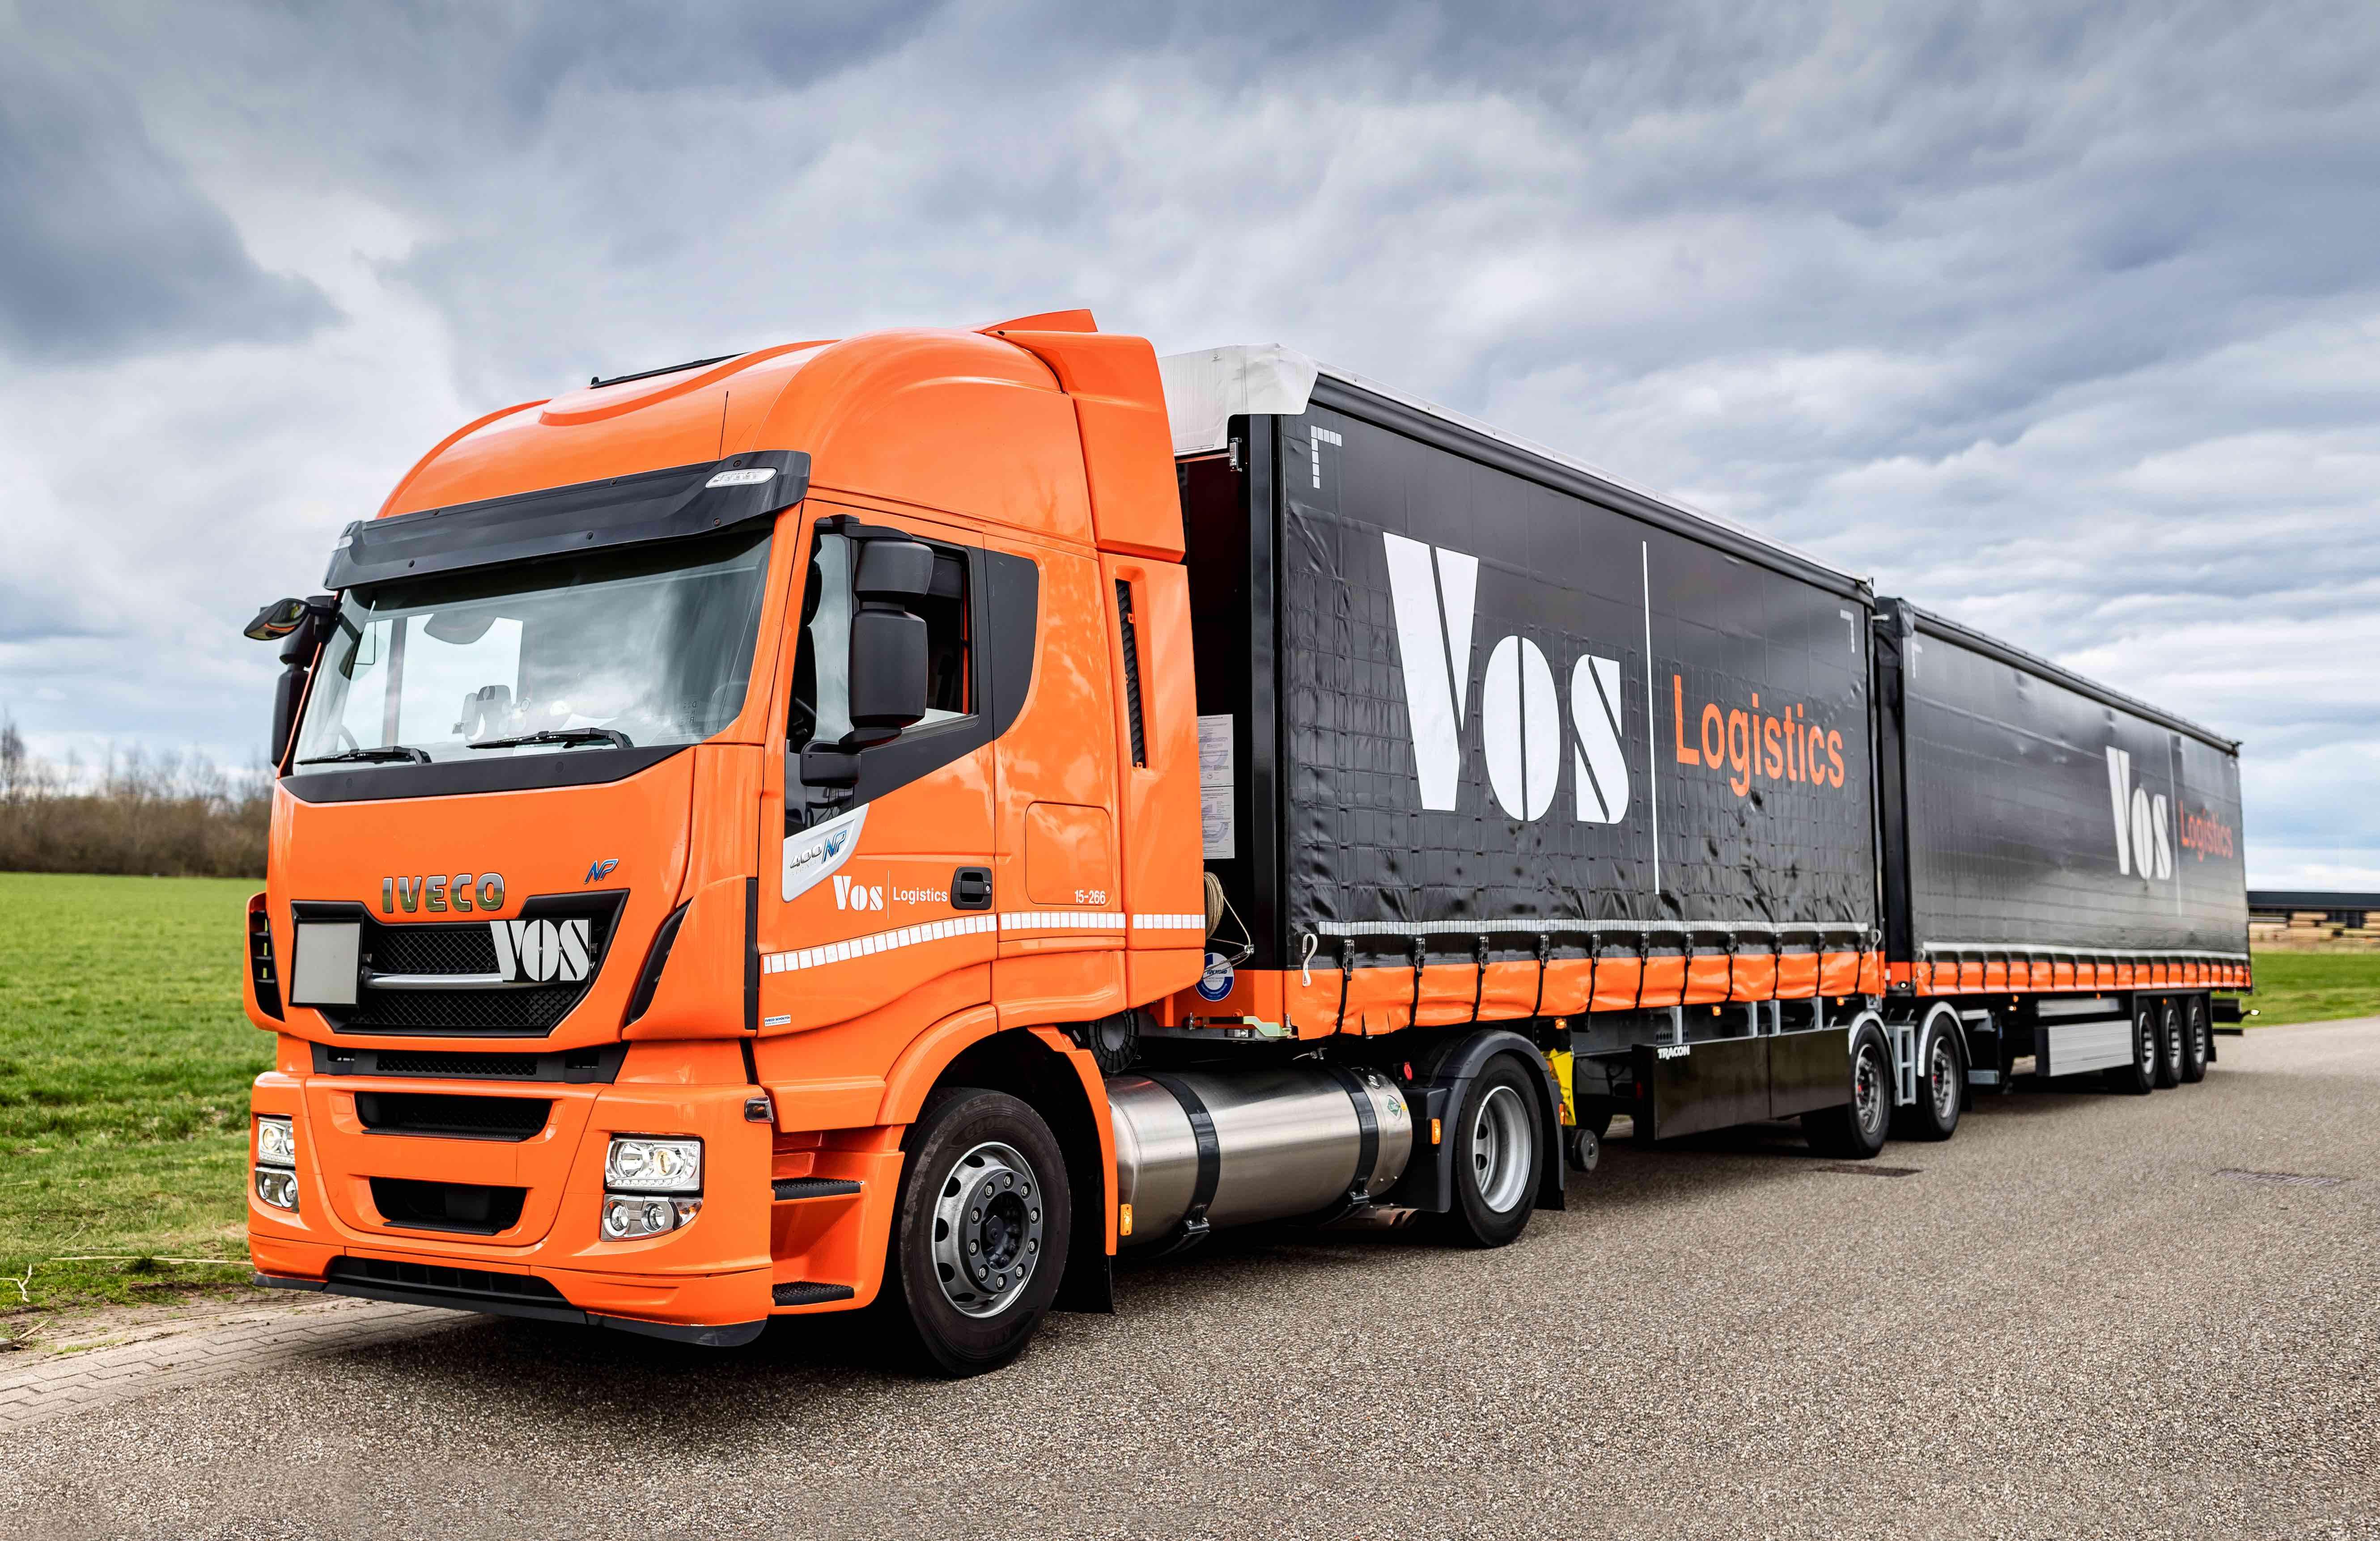 Wabco annuncia un importante accordo con Vos Logistics